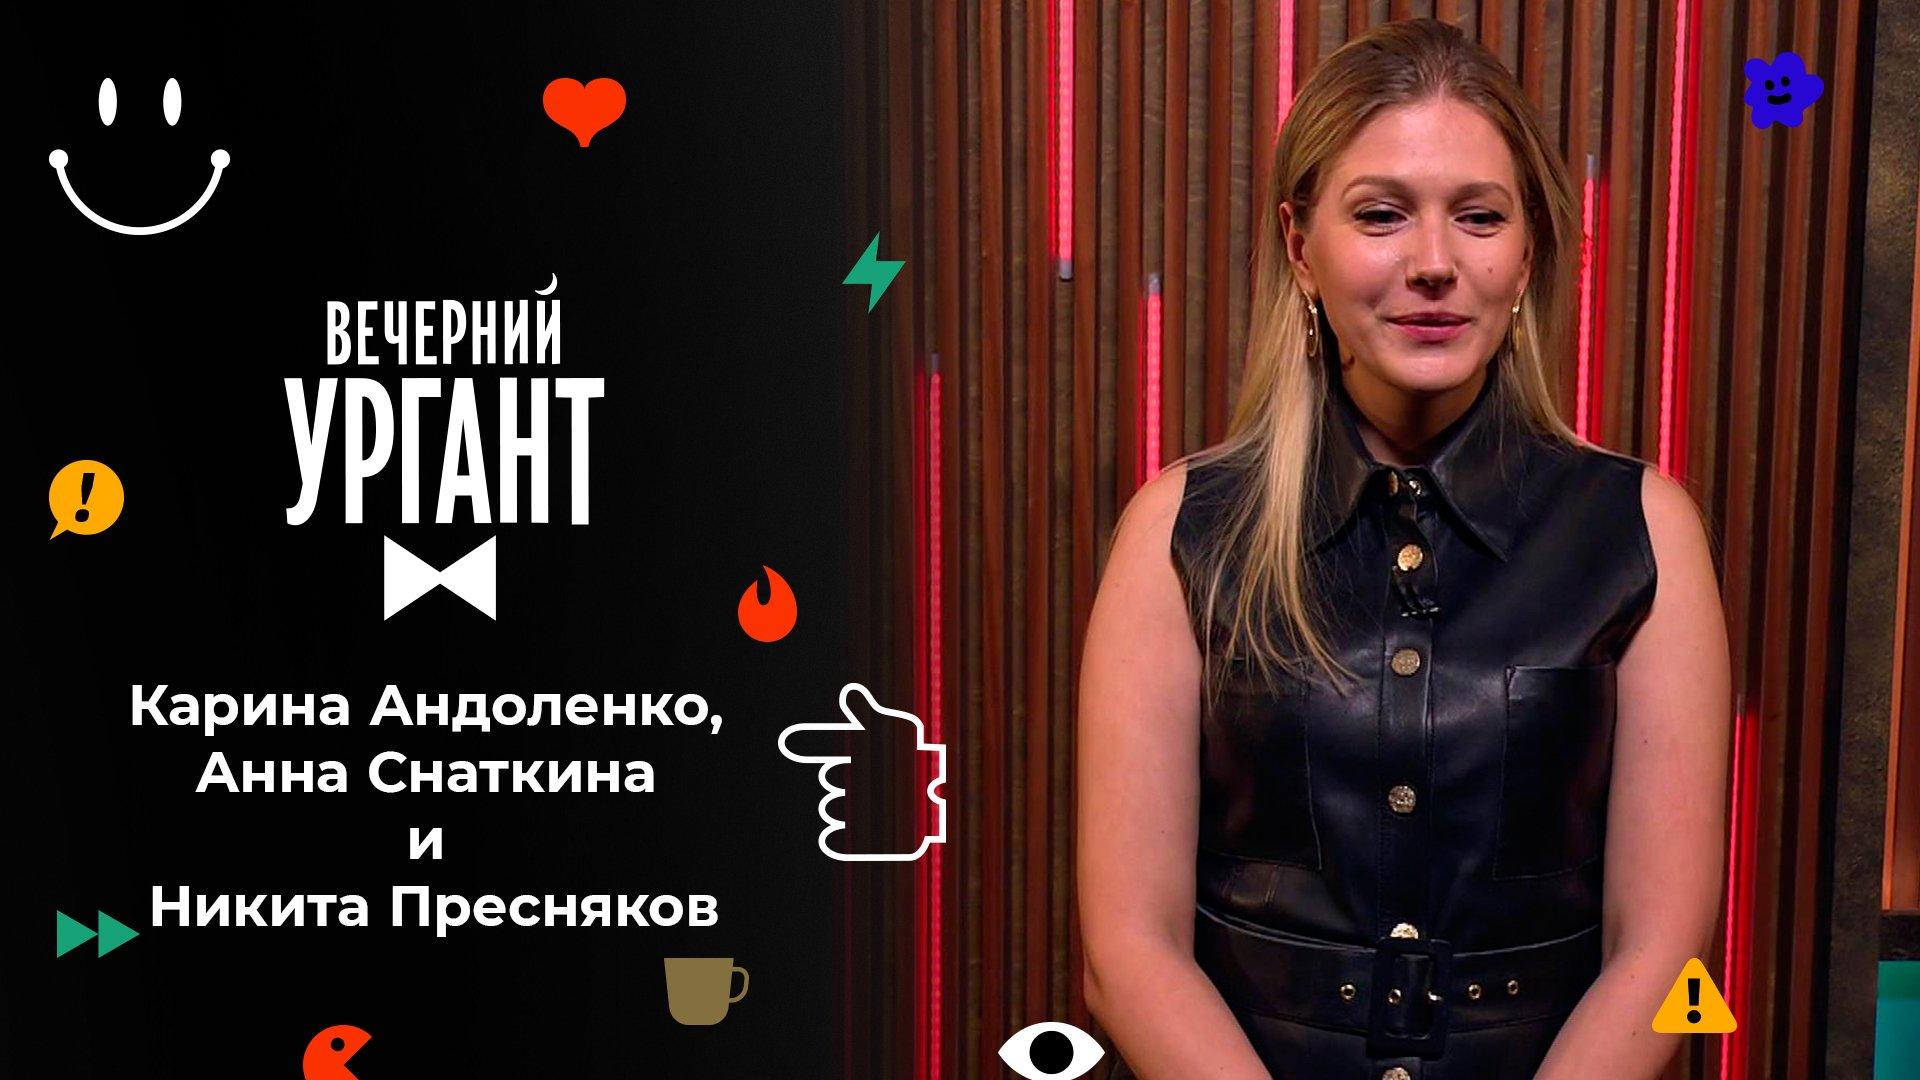 «Вечерний Ургант». Карина Андоленко, Анна Снаткина иНикита Пресняков